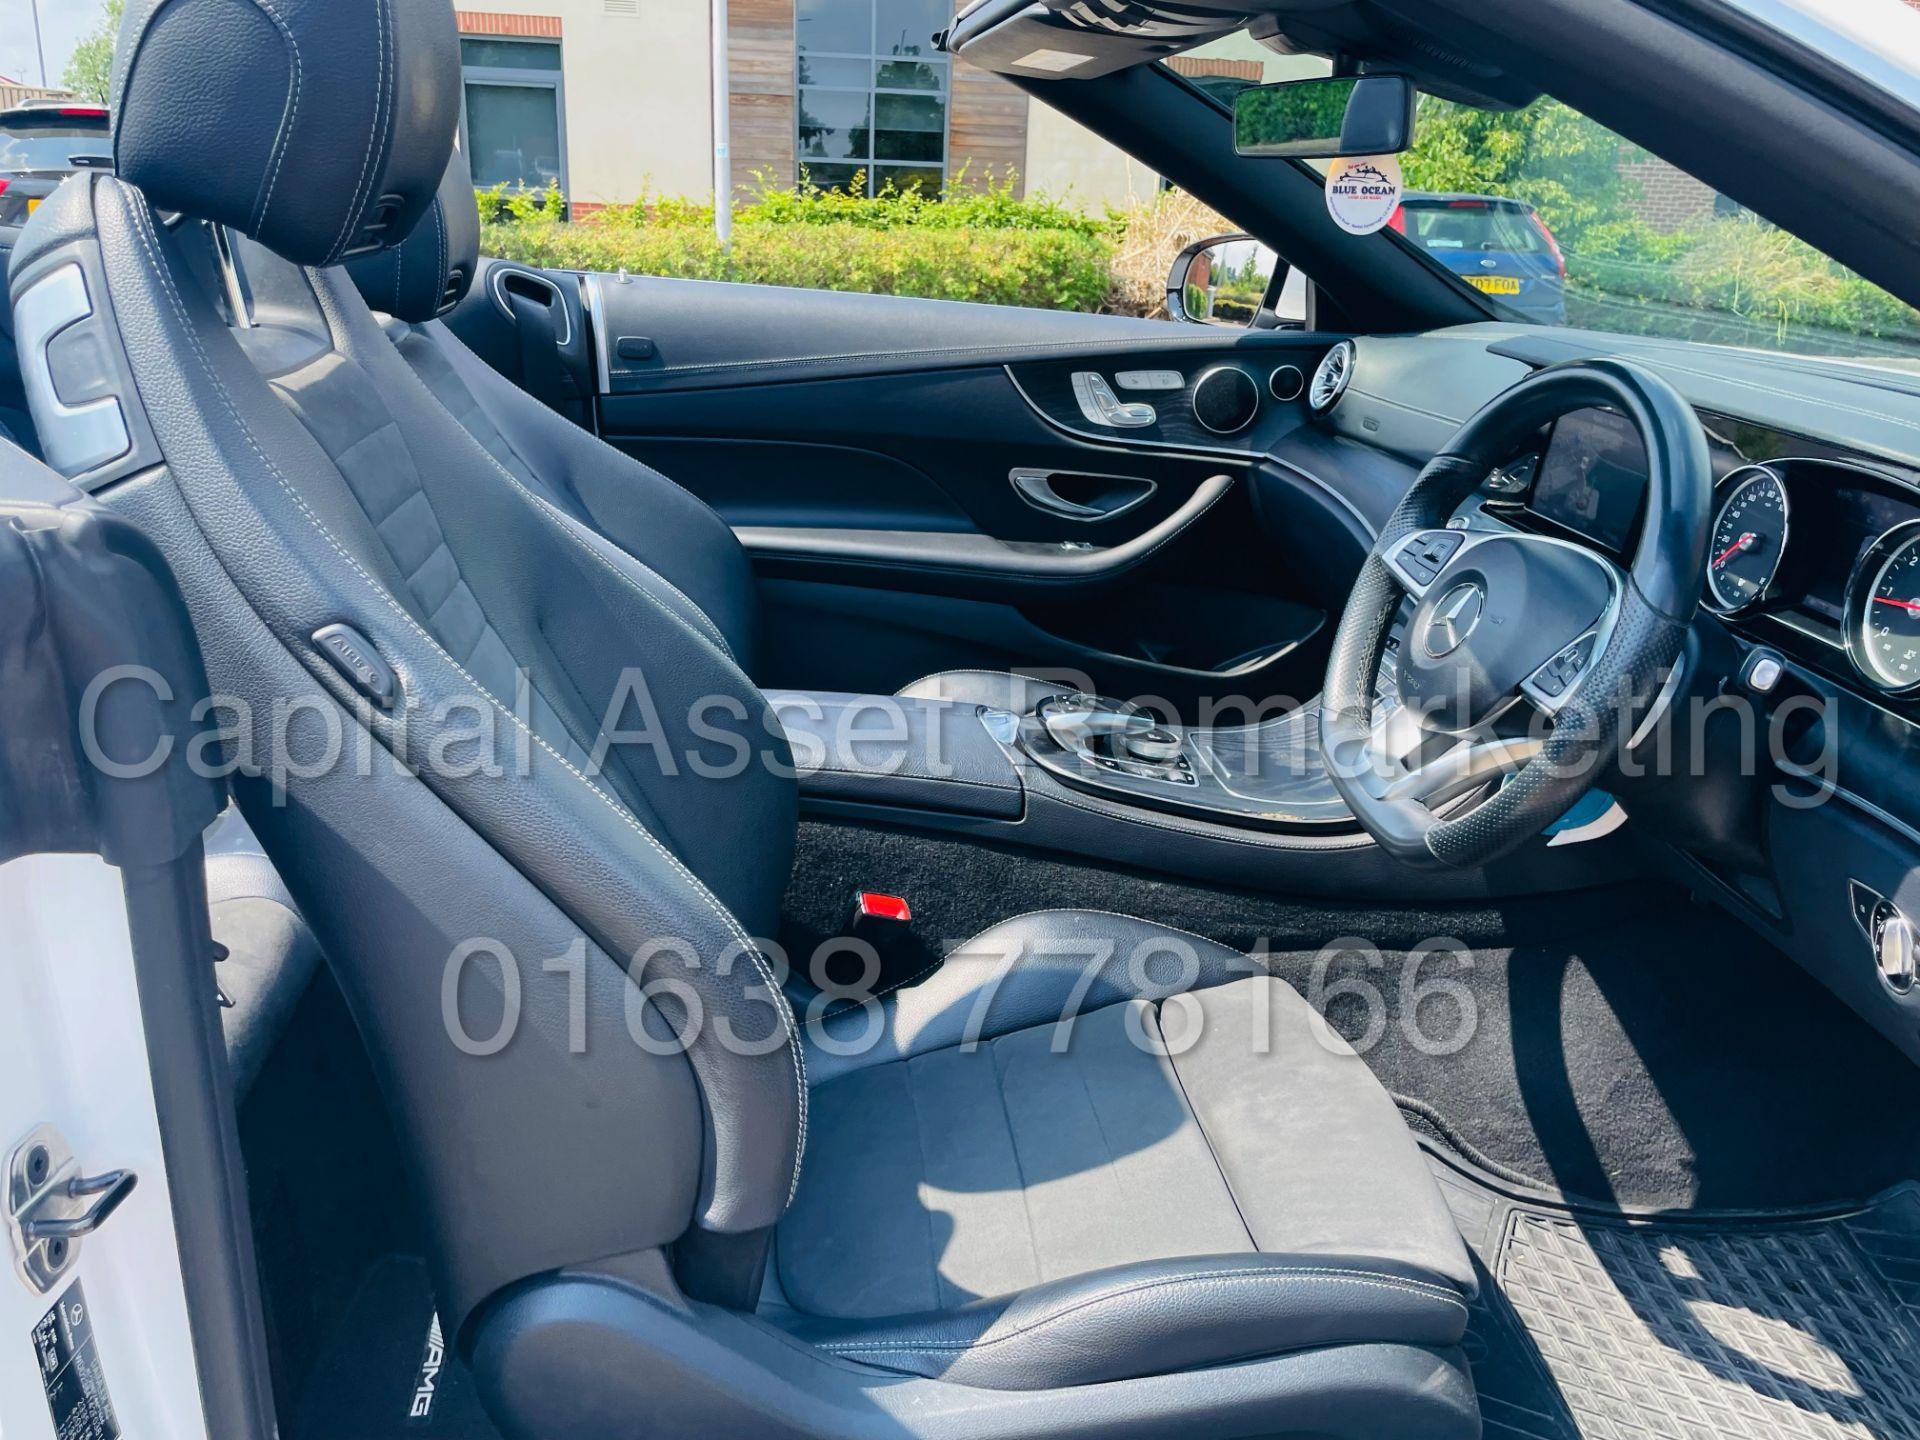 MERCEDES-BENZ E220d *AMG LINE PREMIUM - CABRIOLET* (2018 - EURO 6) '9G AUTO - LEATHER - SAT NAV' - Image 48 of 63